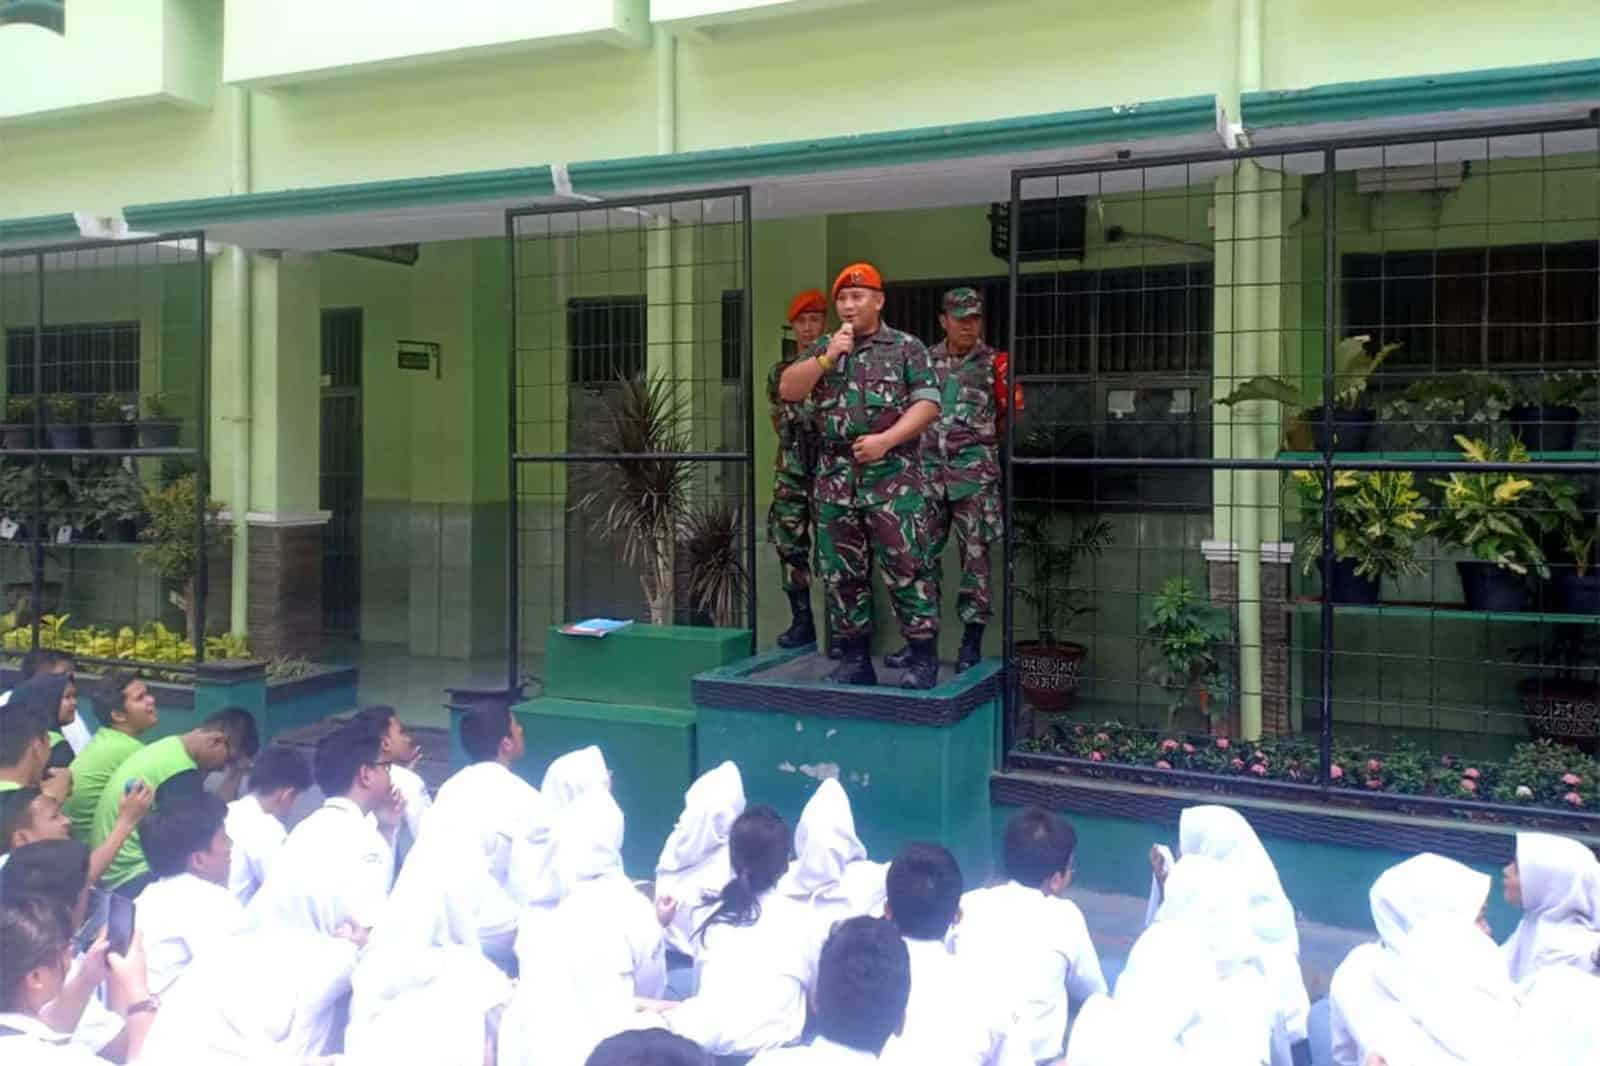 Satgas Pam Unras Yonko 462 Paskhas Melaksanakan Komsos di SMK Negeri 19 Jakarta Pusat